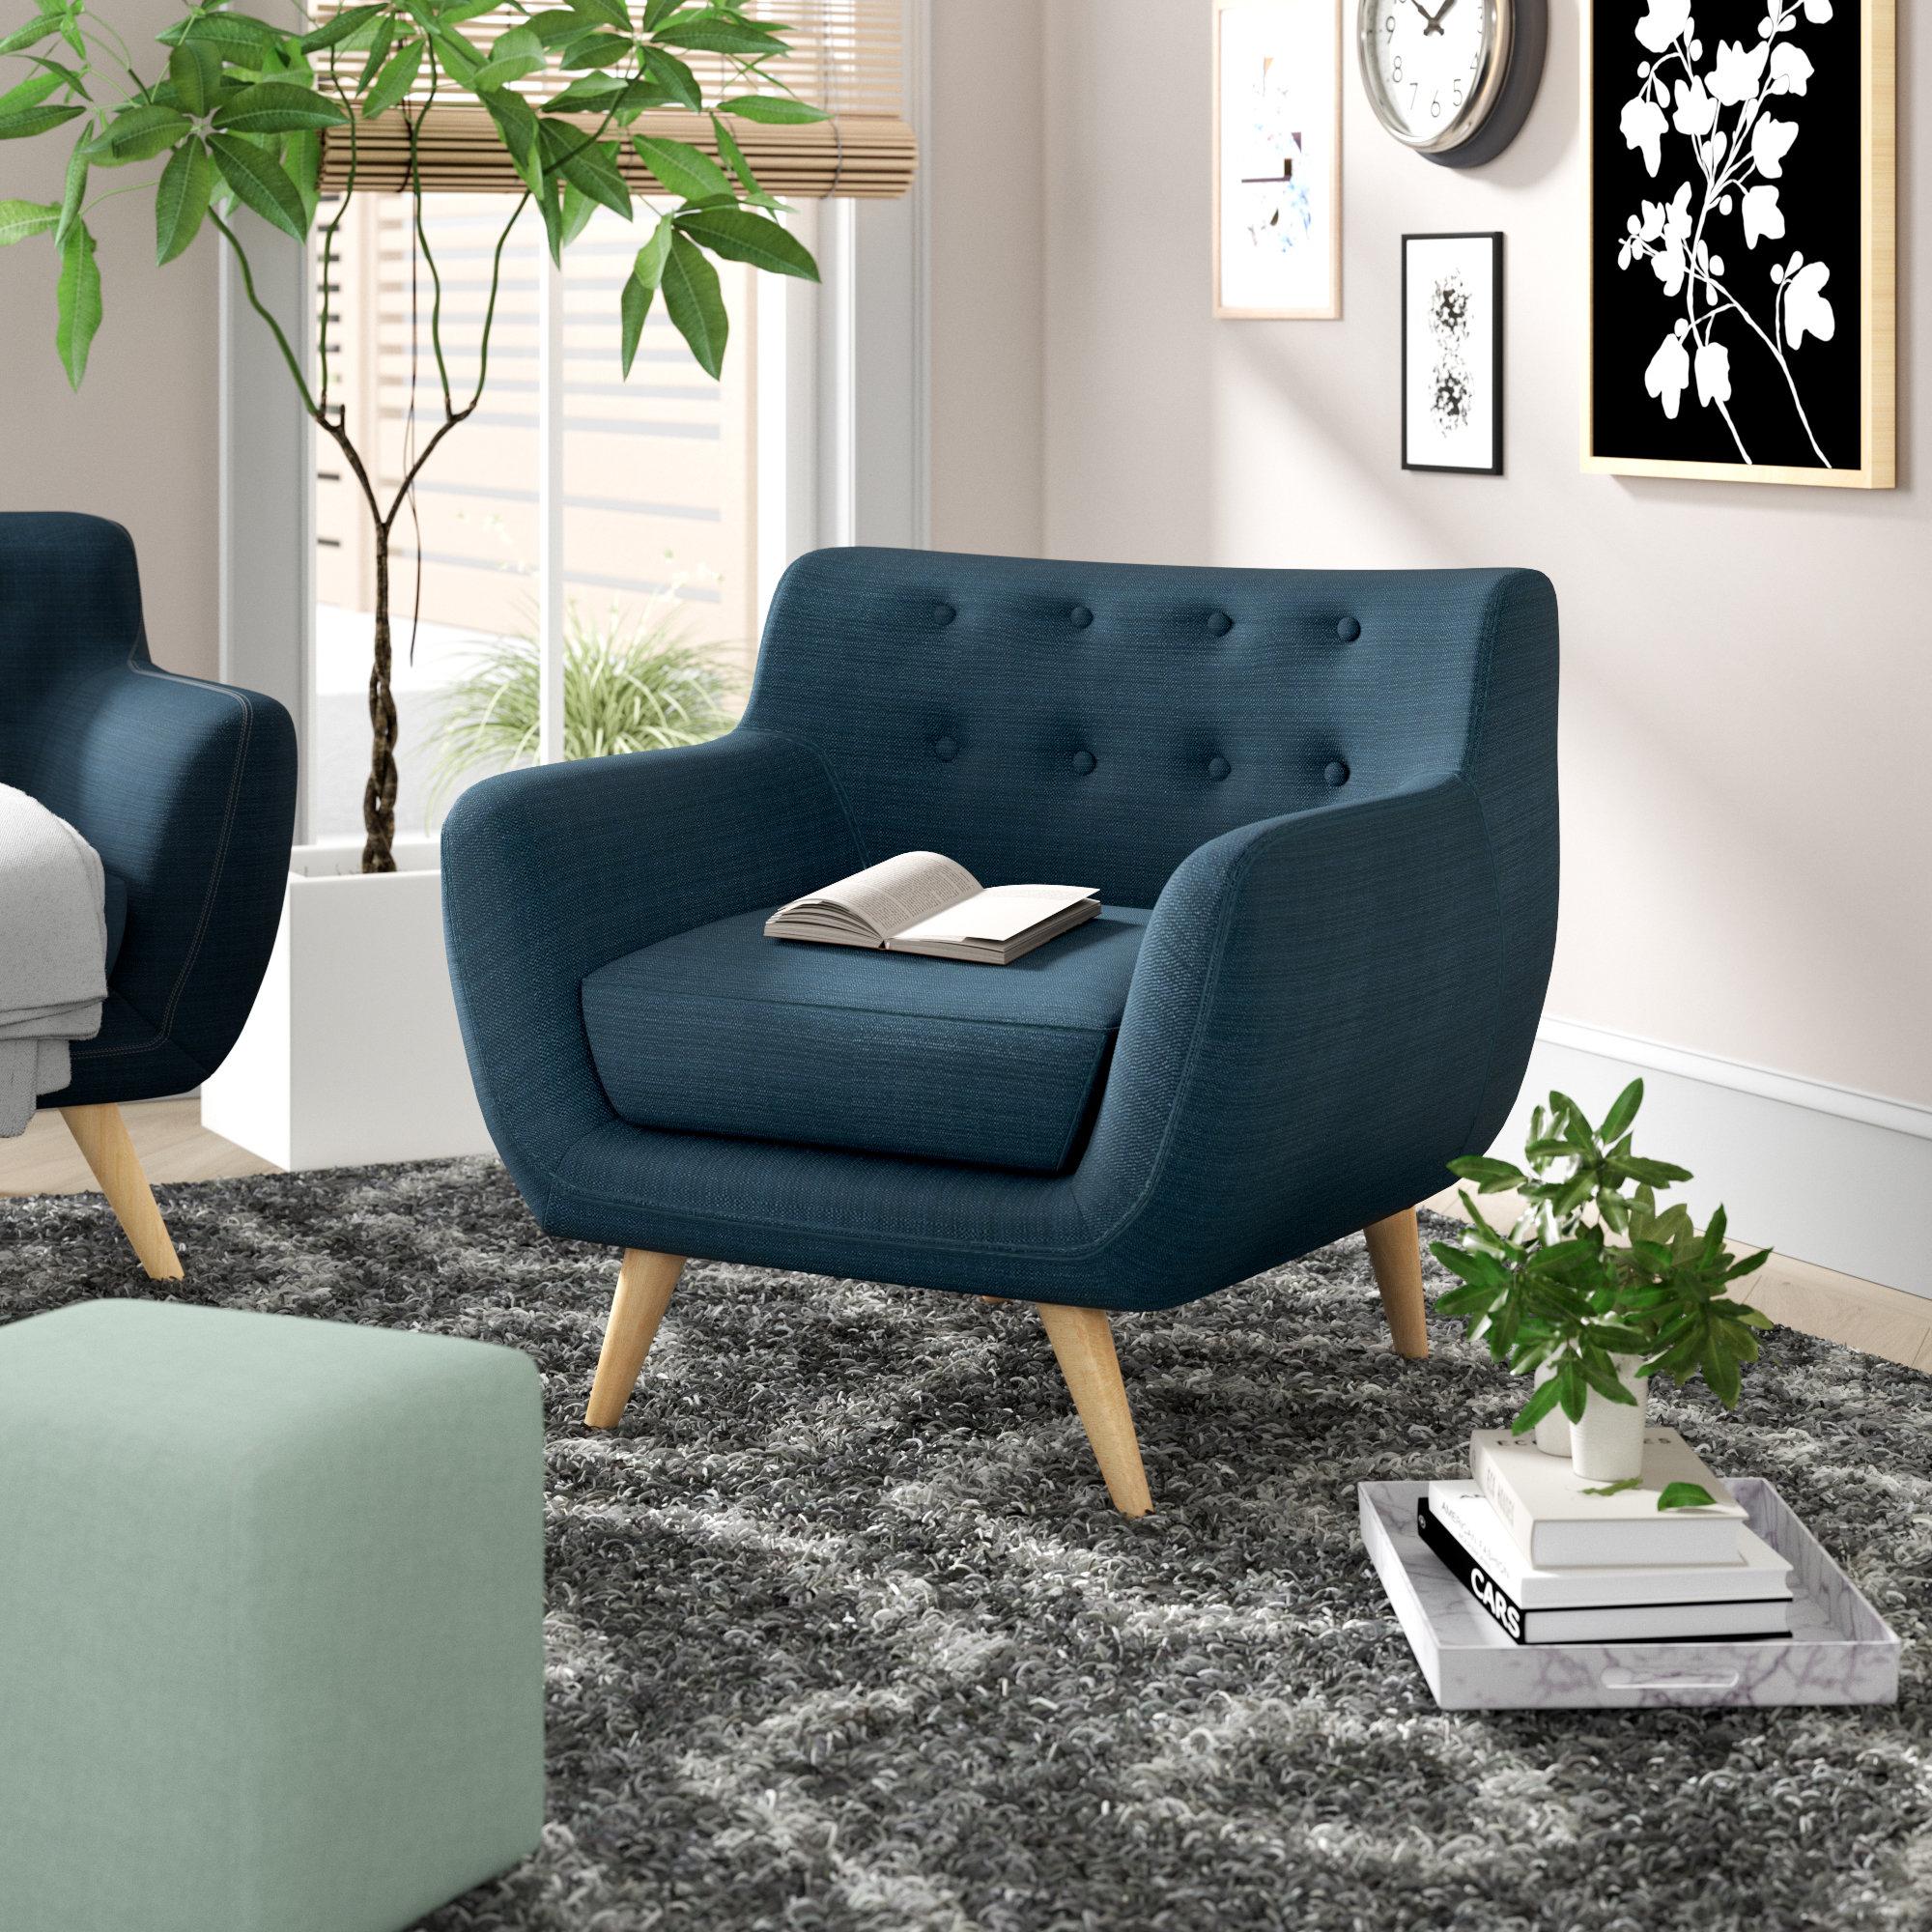 Langley Street Matteo Armchair & Reviews | Wayfair For Matteo Arm Sofa Chairs (Image 5 of 20)